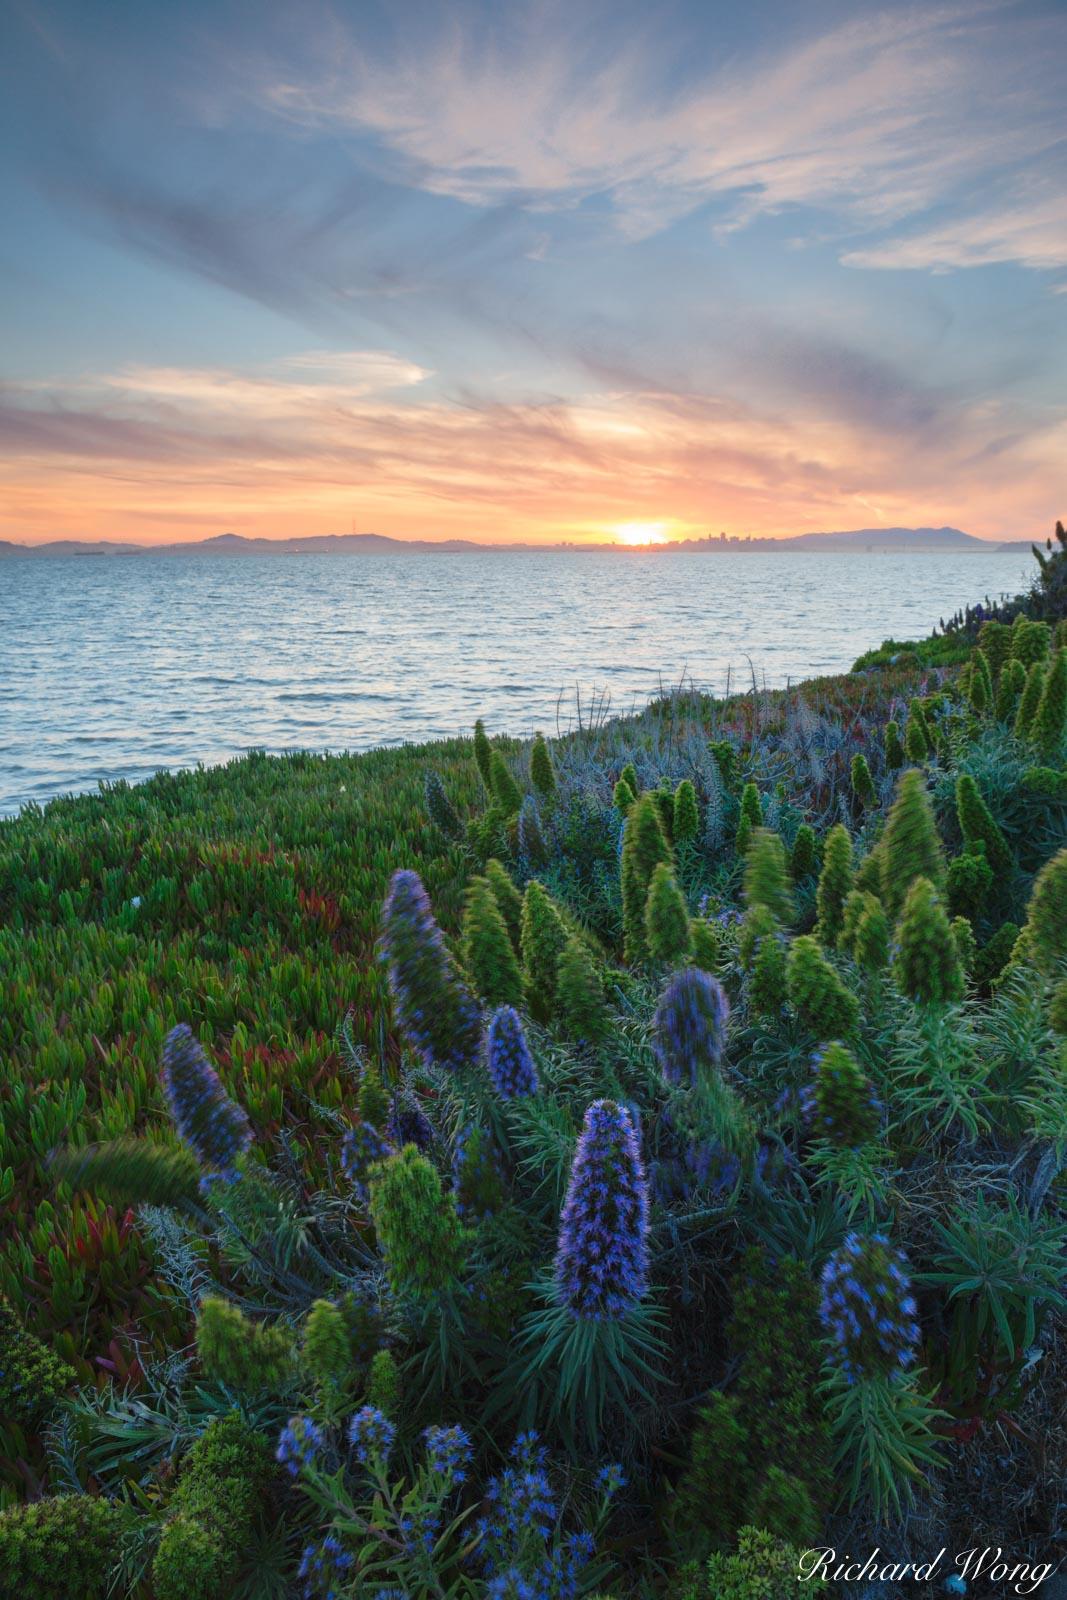 alameda, flowers, harbor bay, landscape, nature, northern california, outdoors, outside, plants, purple bush lupine, san francisco east bay, san francisco skyline, scenic, shoreline, sunset, united st, photo